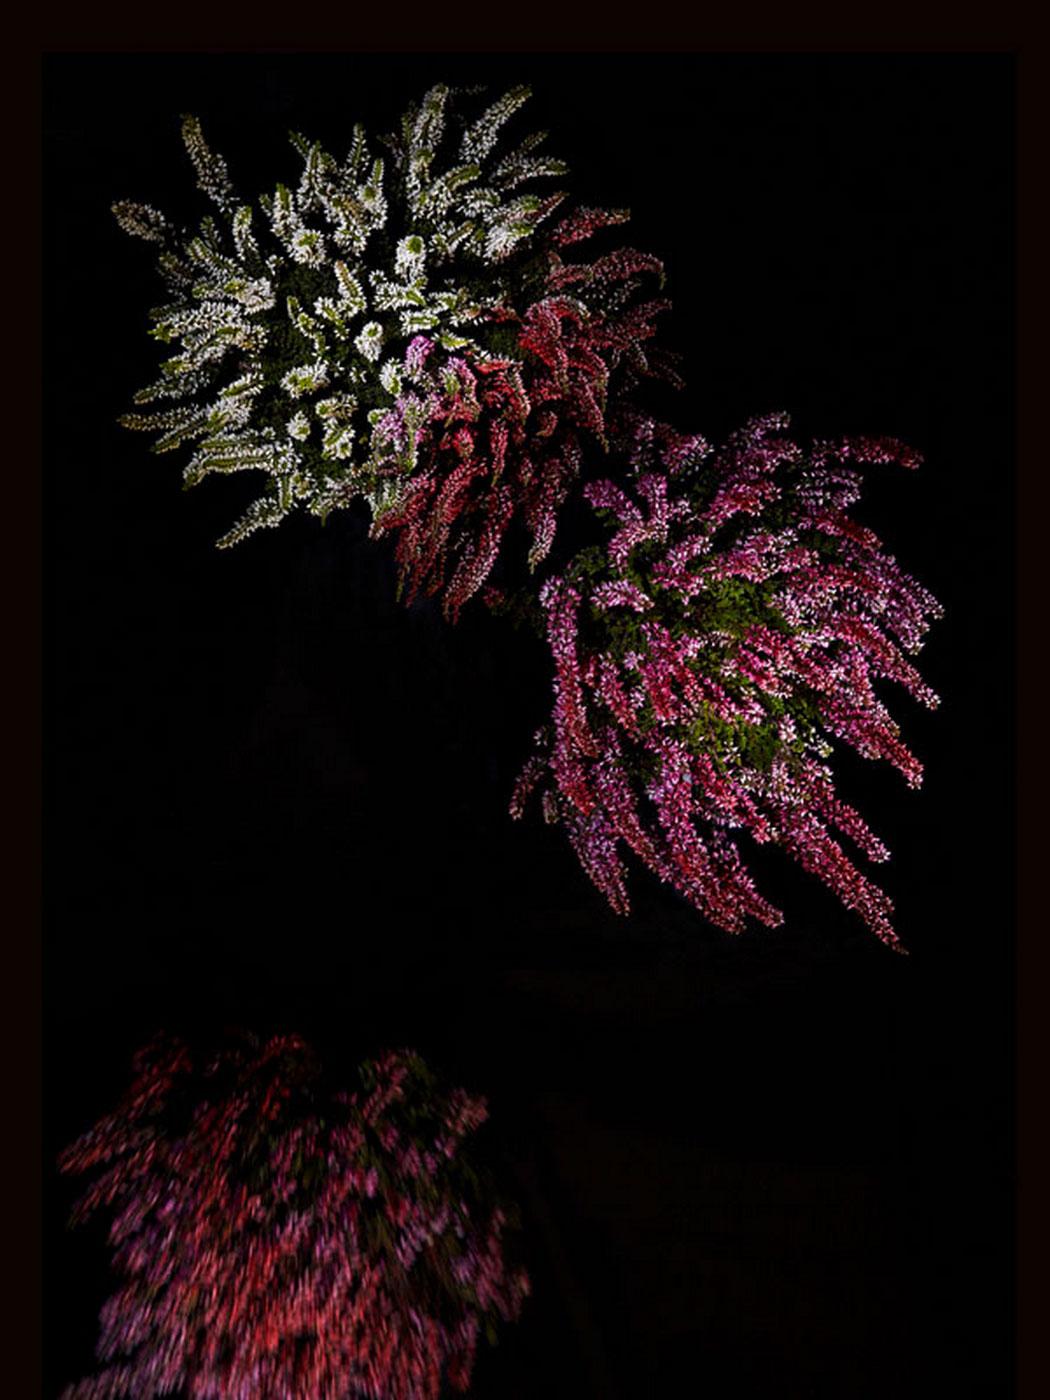 sarah-illenberger-flowerwork-09.jpg